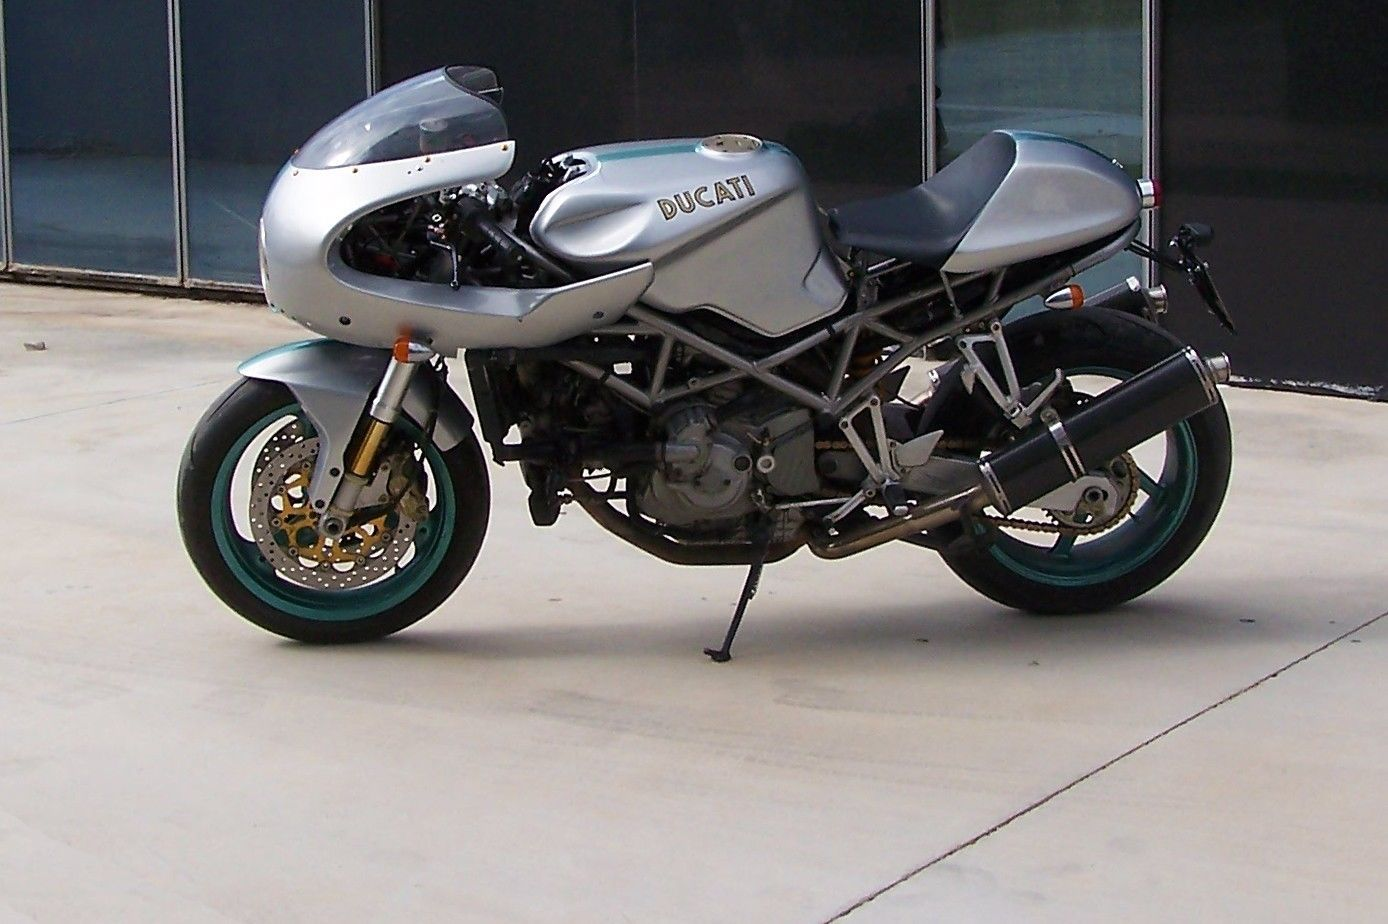 Ducati St Cafe Racer Convertion Kit Ebay Voiture Motos